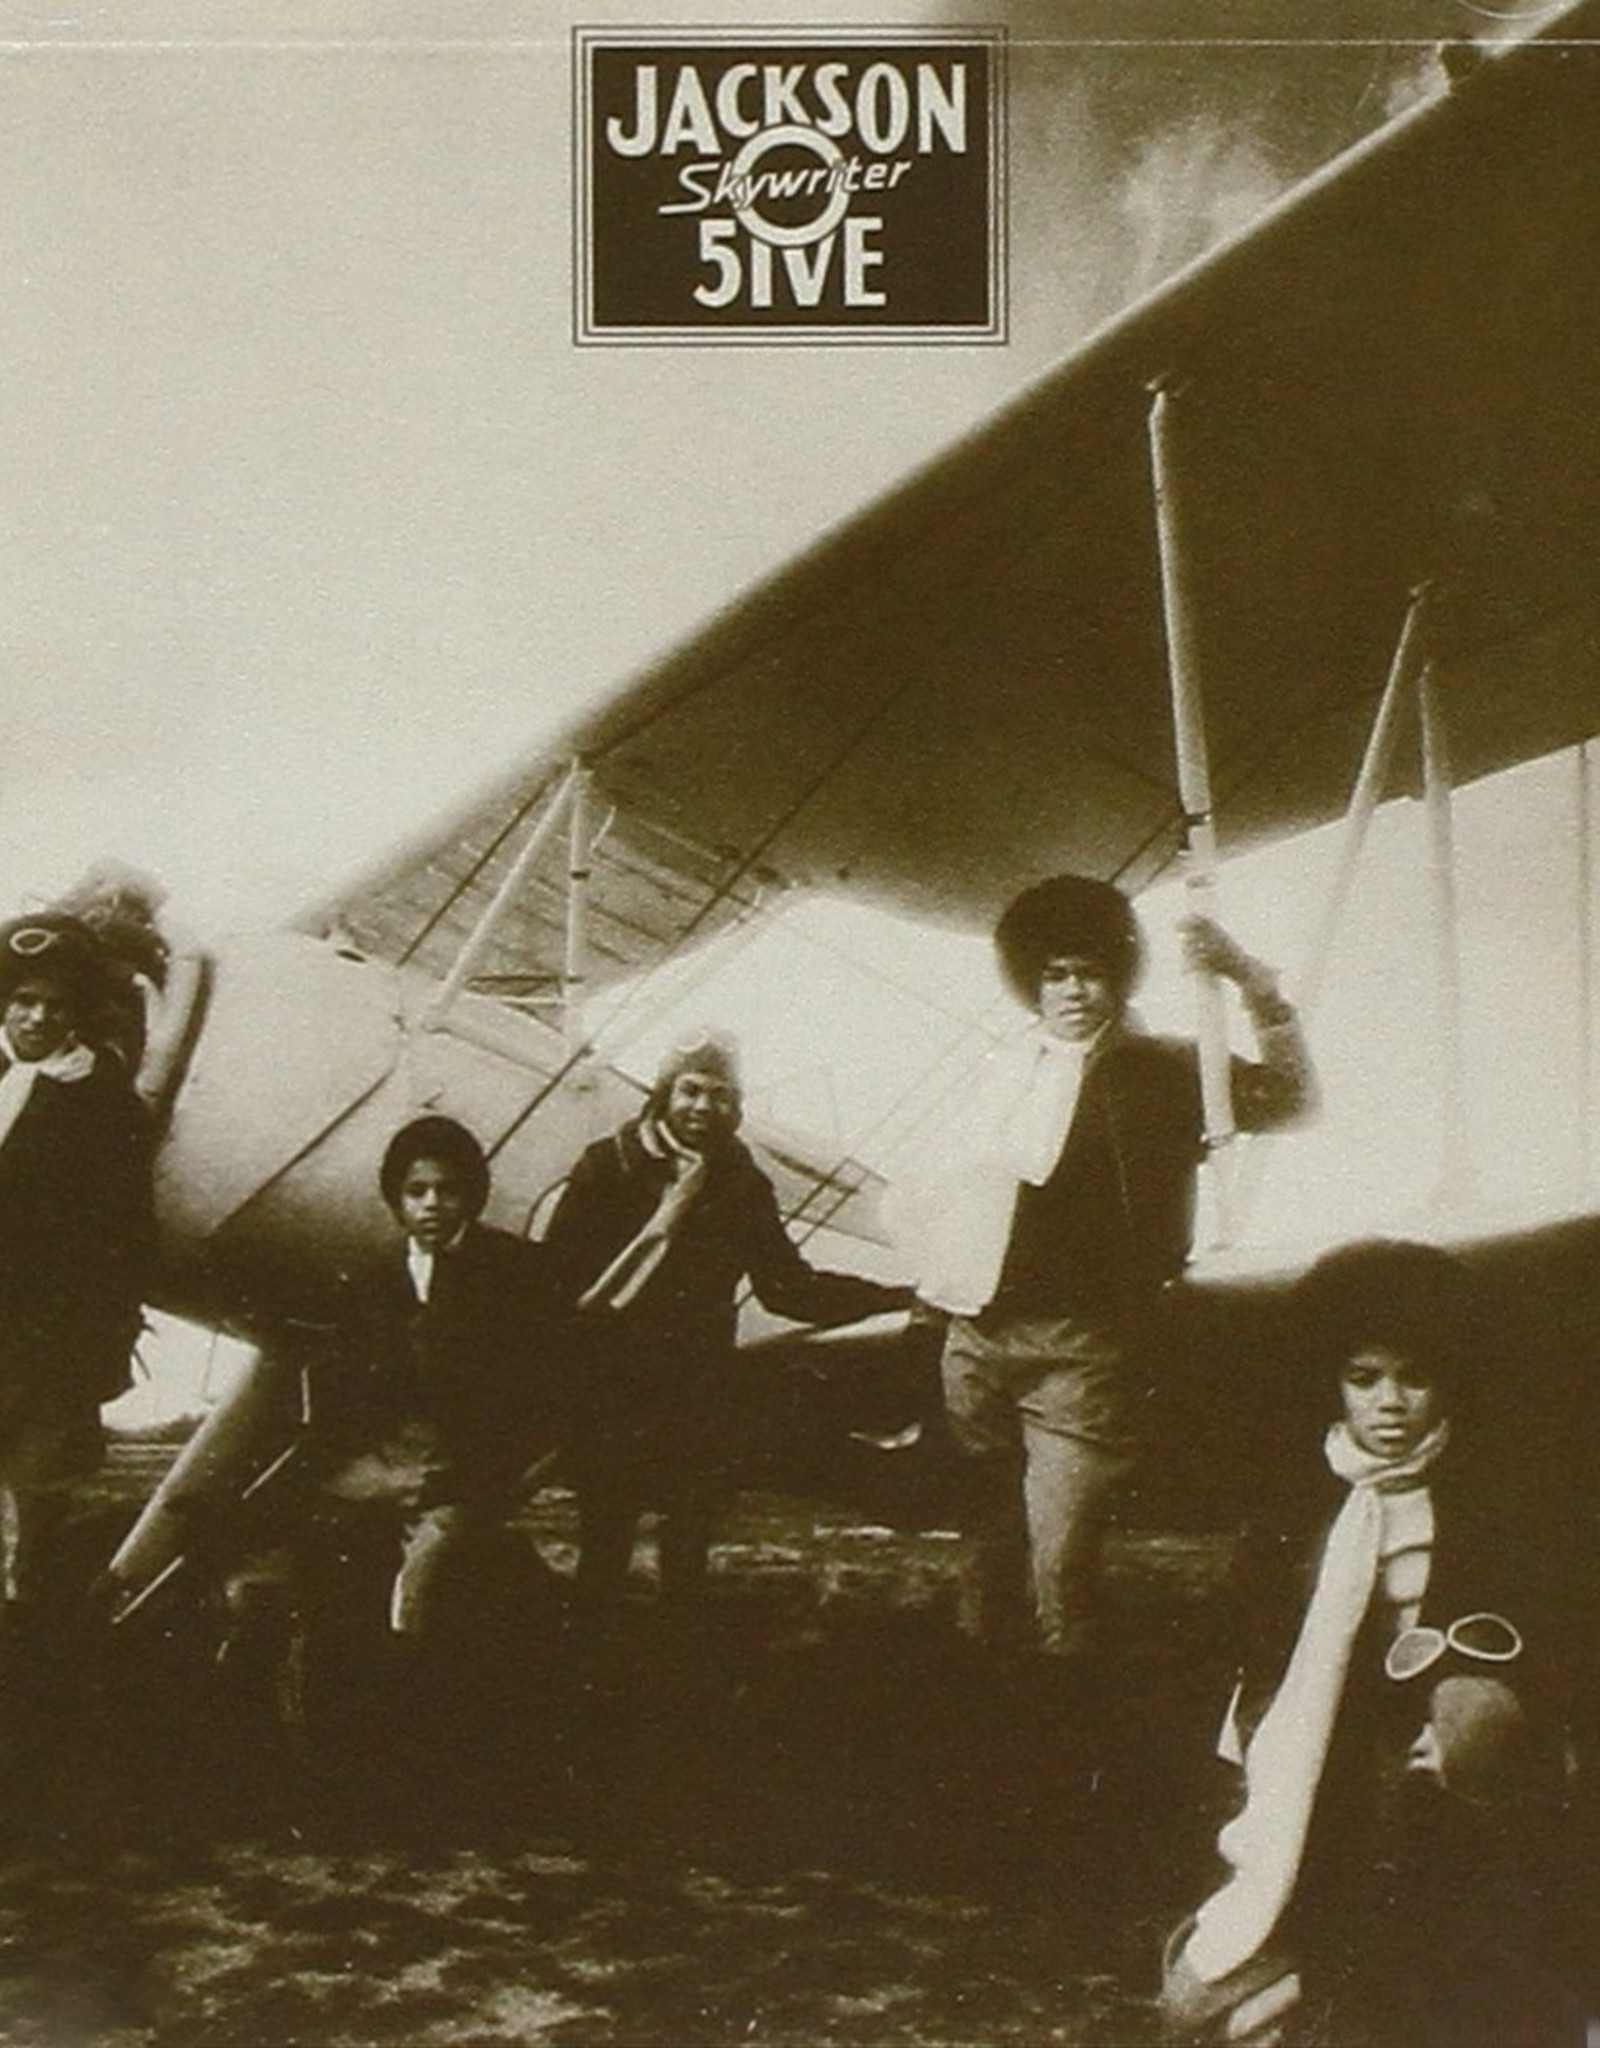 Jackson 5 - Skywriter